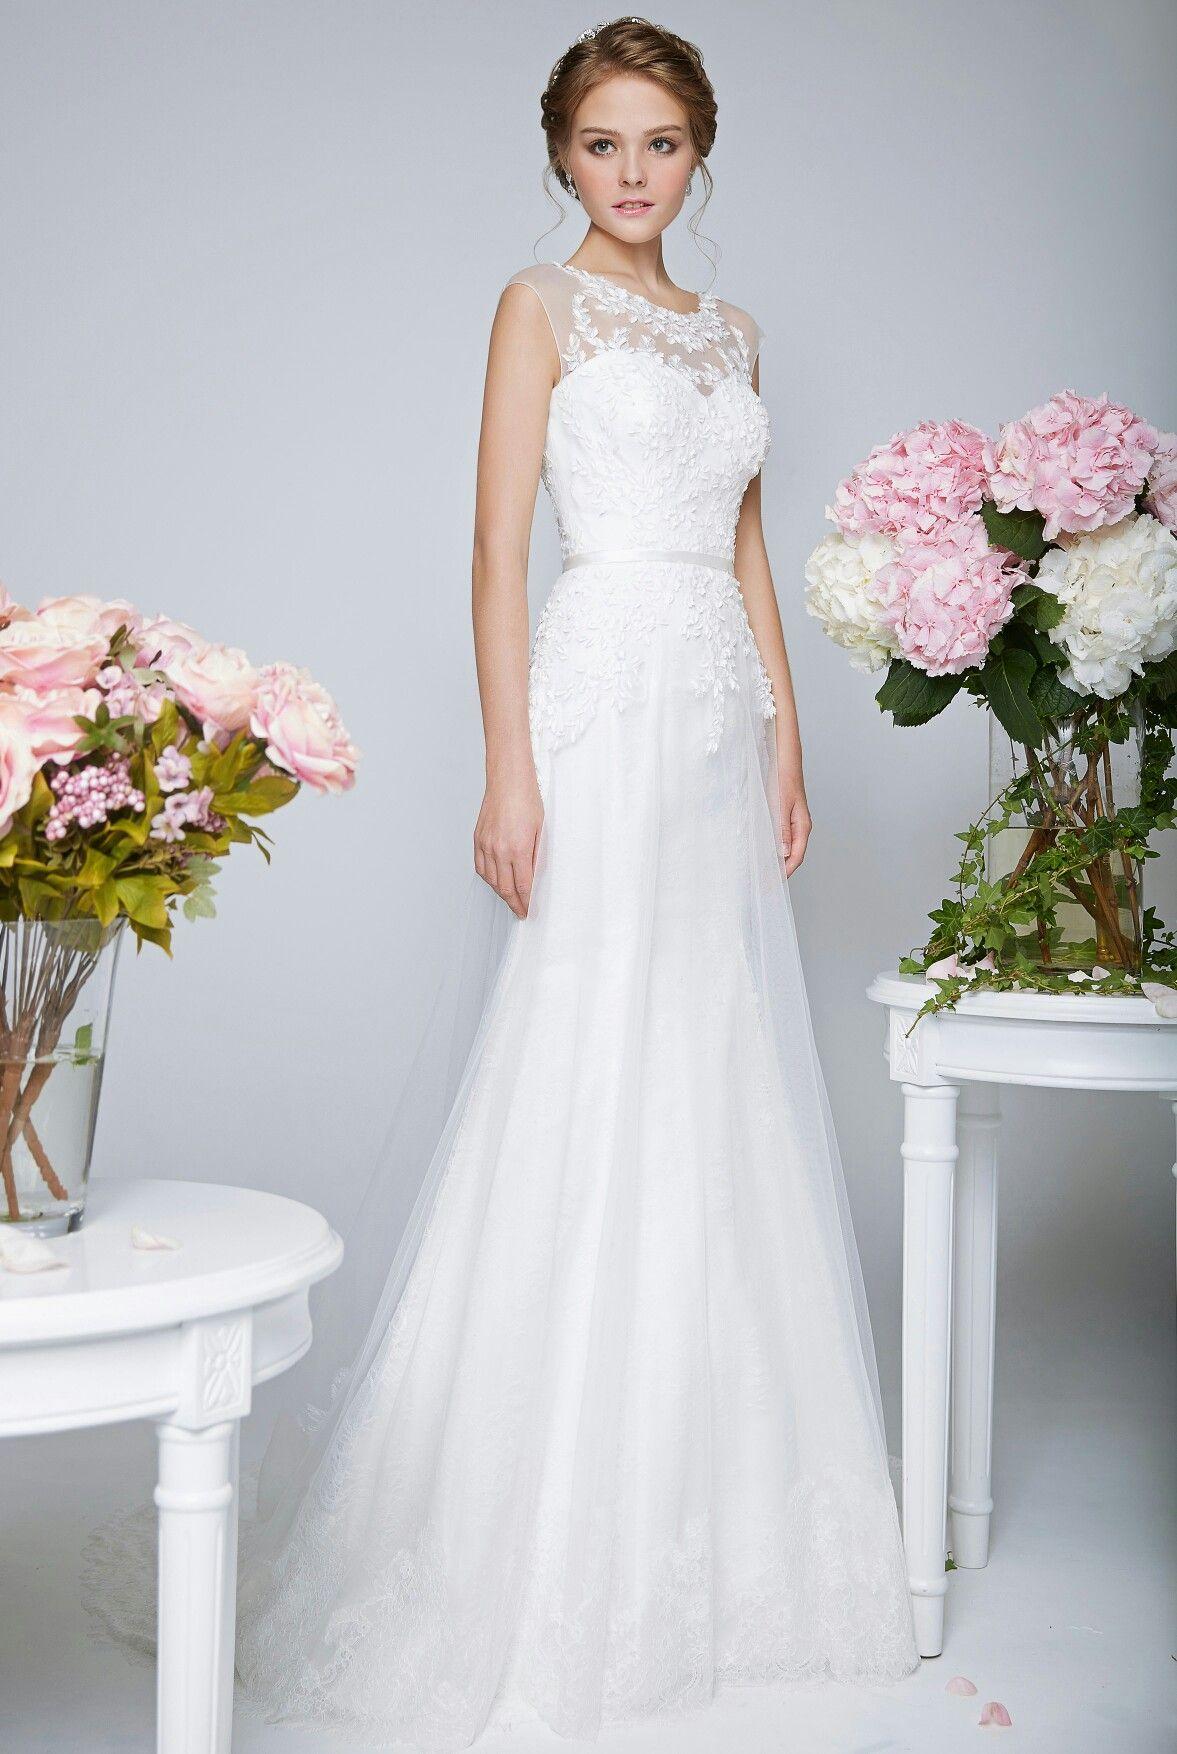 Wedding dresses rental  Pin by Vanda Desiree on Wedding dresses  Pinterest  Wedding